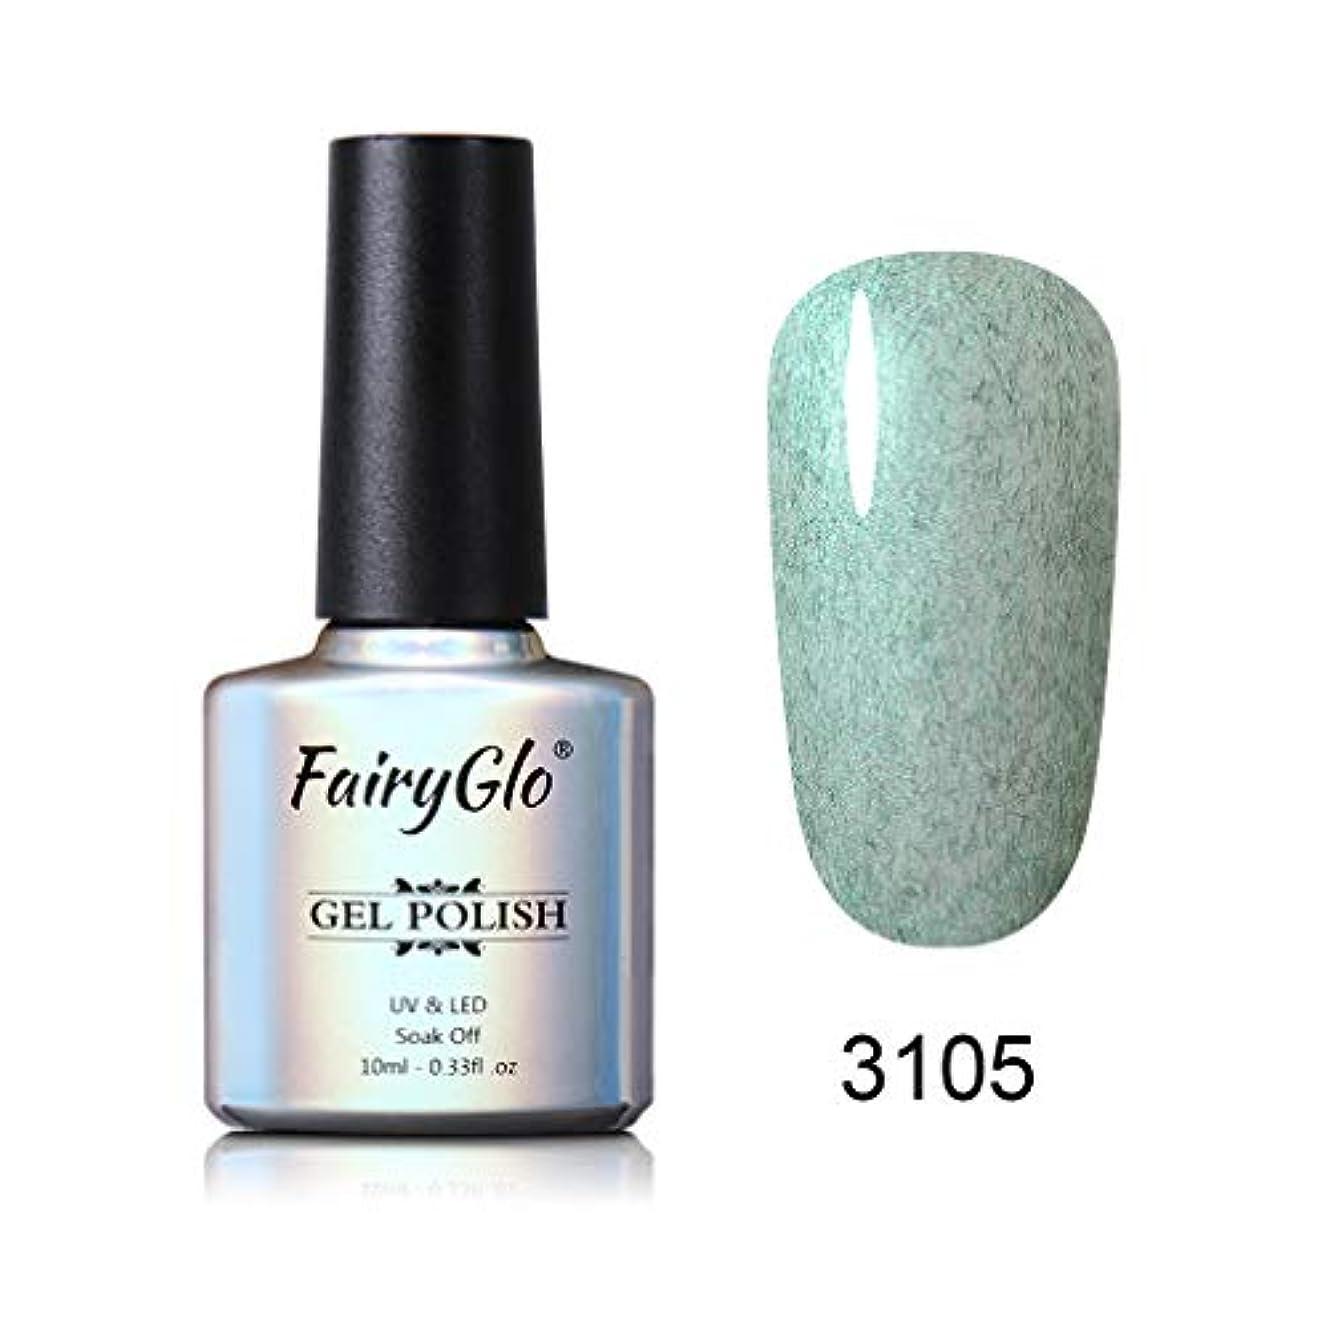 Fairyglo ジェルネイル カラージェル 貝殻毛皮系 1色入り 10ml【全12色選択可】